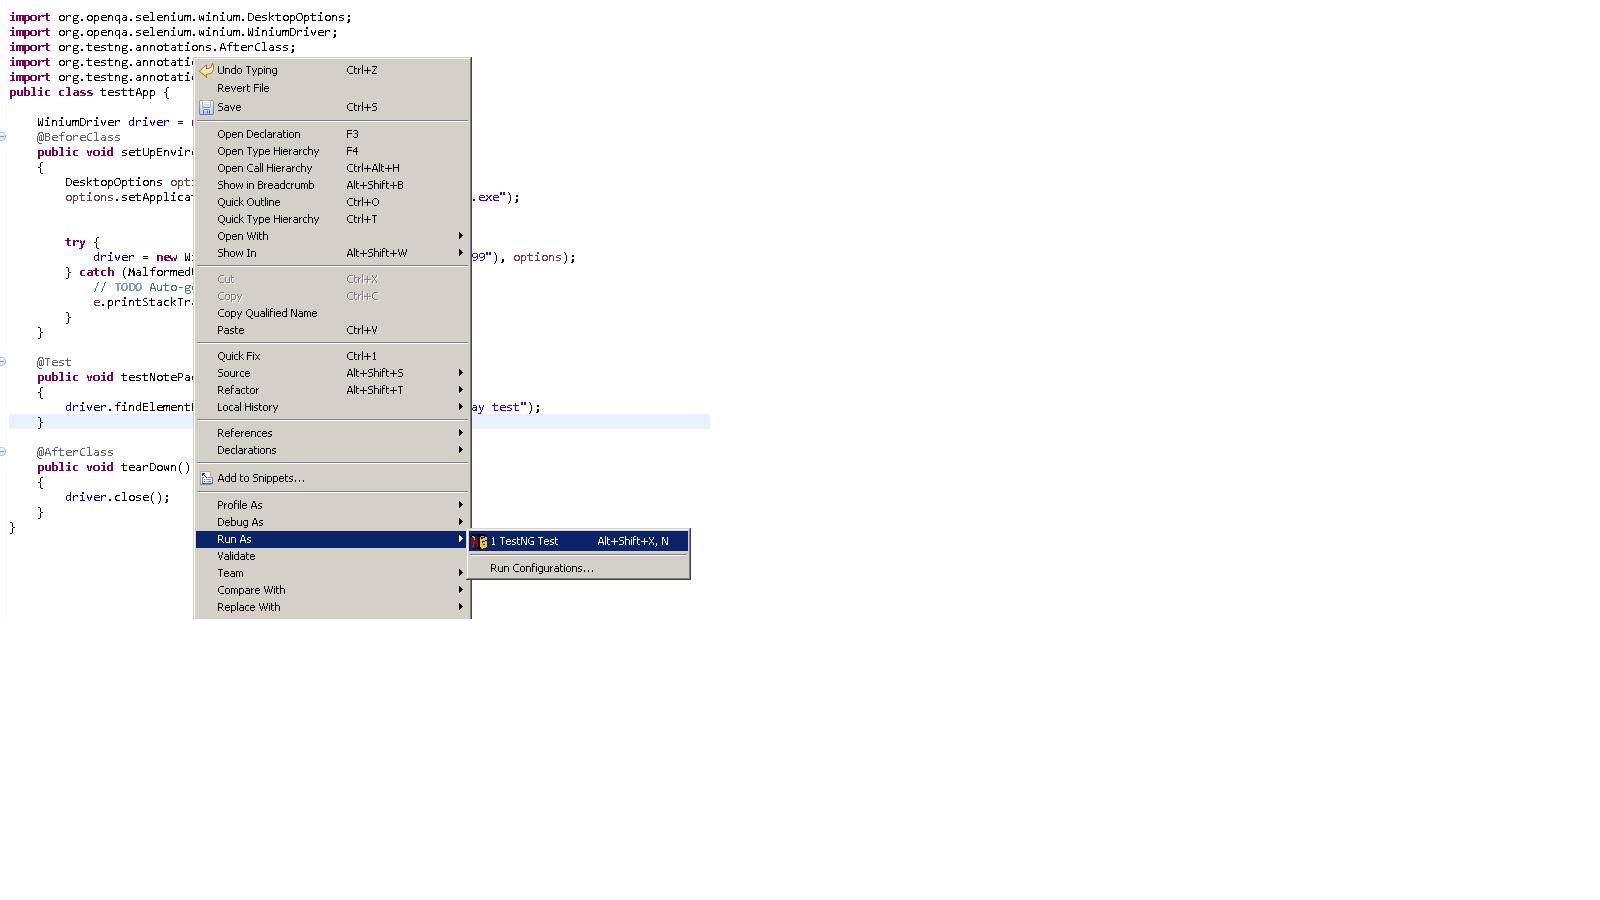 Automation of Windows Apps using Winium - Uday Here